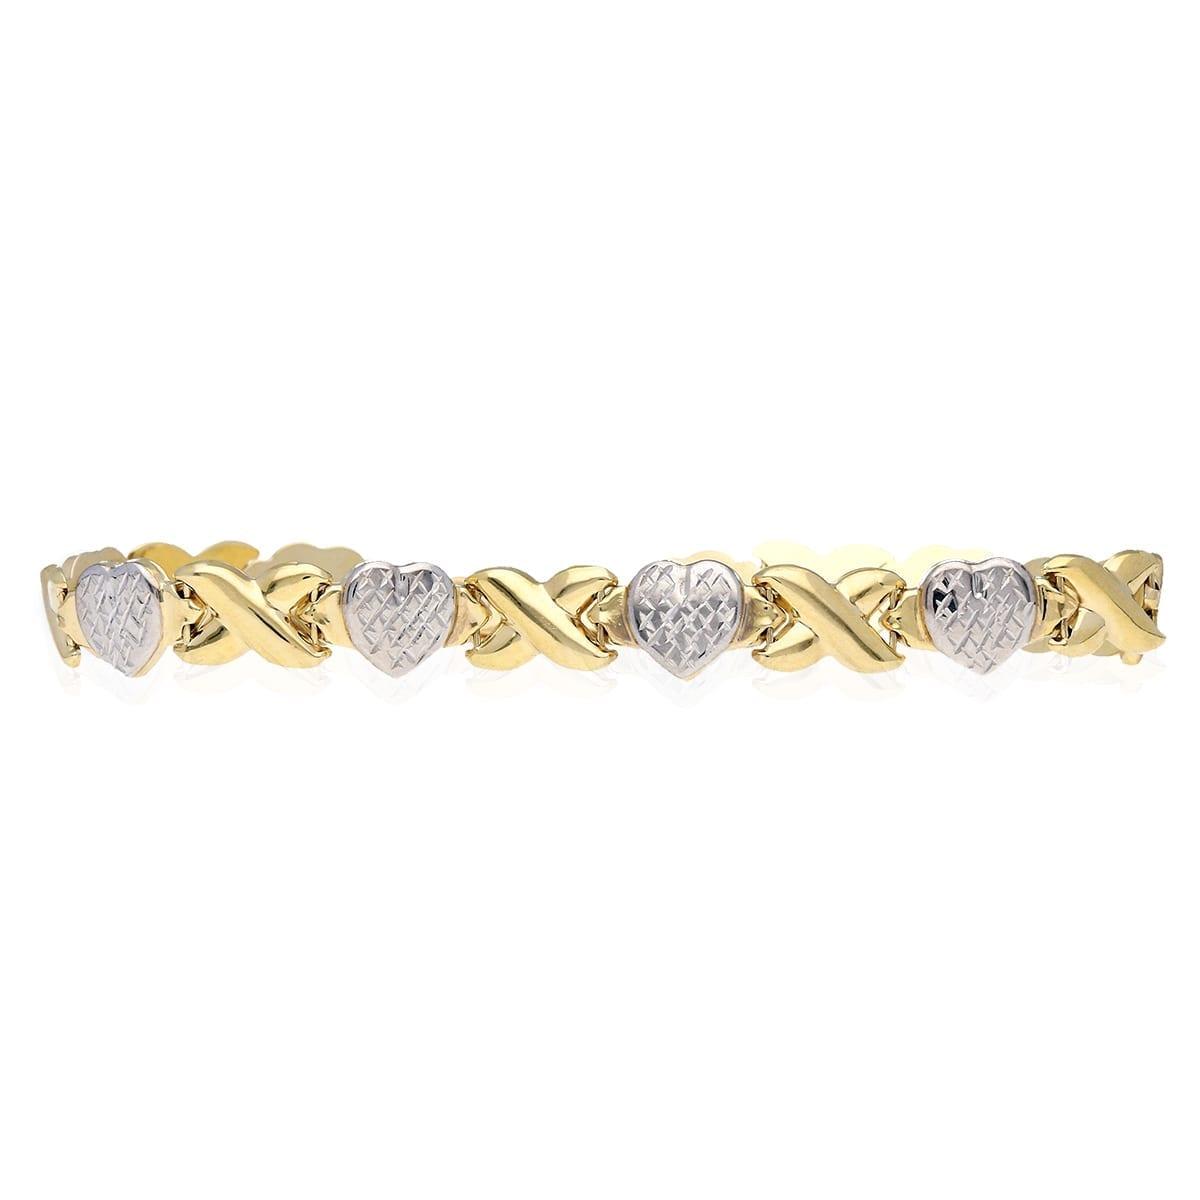 "717877d28 10k Yellow & White Gold Two-Tone Diamond Cut ""XO"" Hearts & Kisses Bracelet  7.25″ | WJD Exclusives"